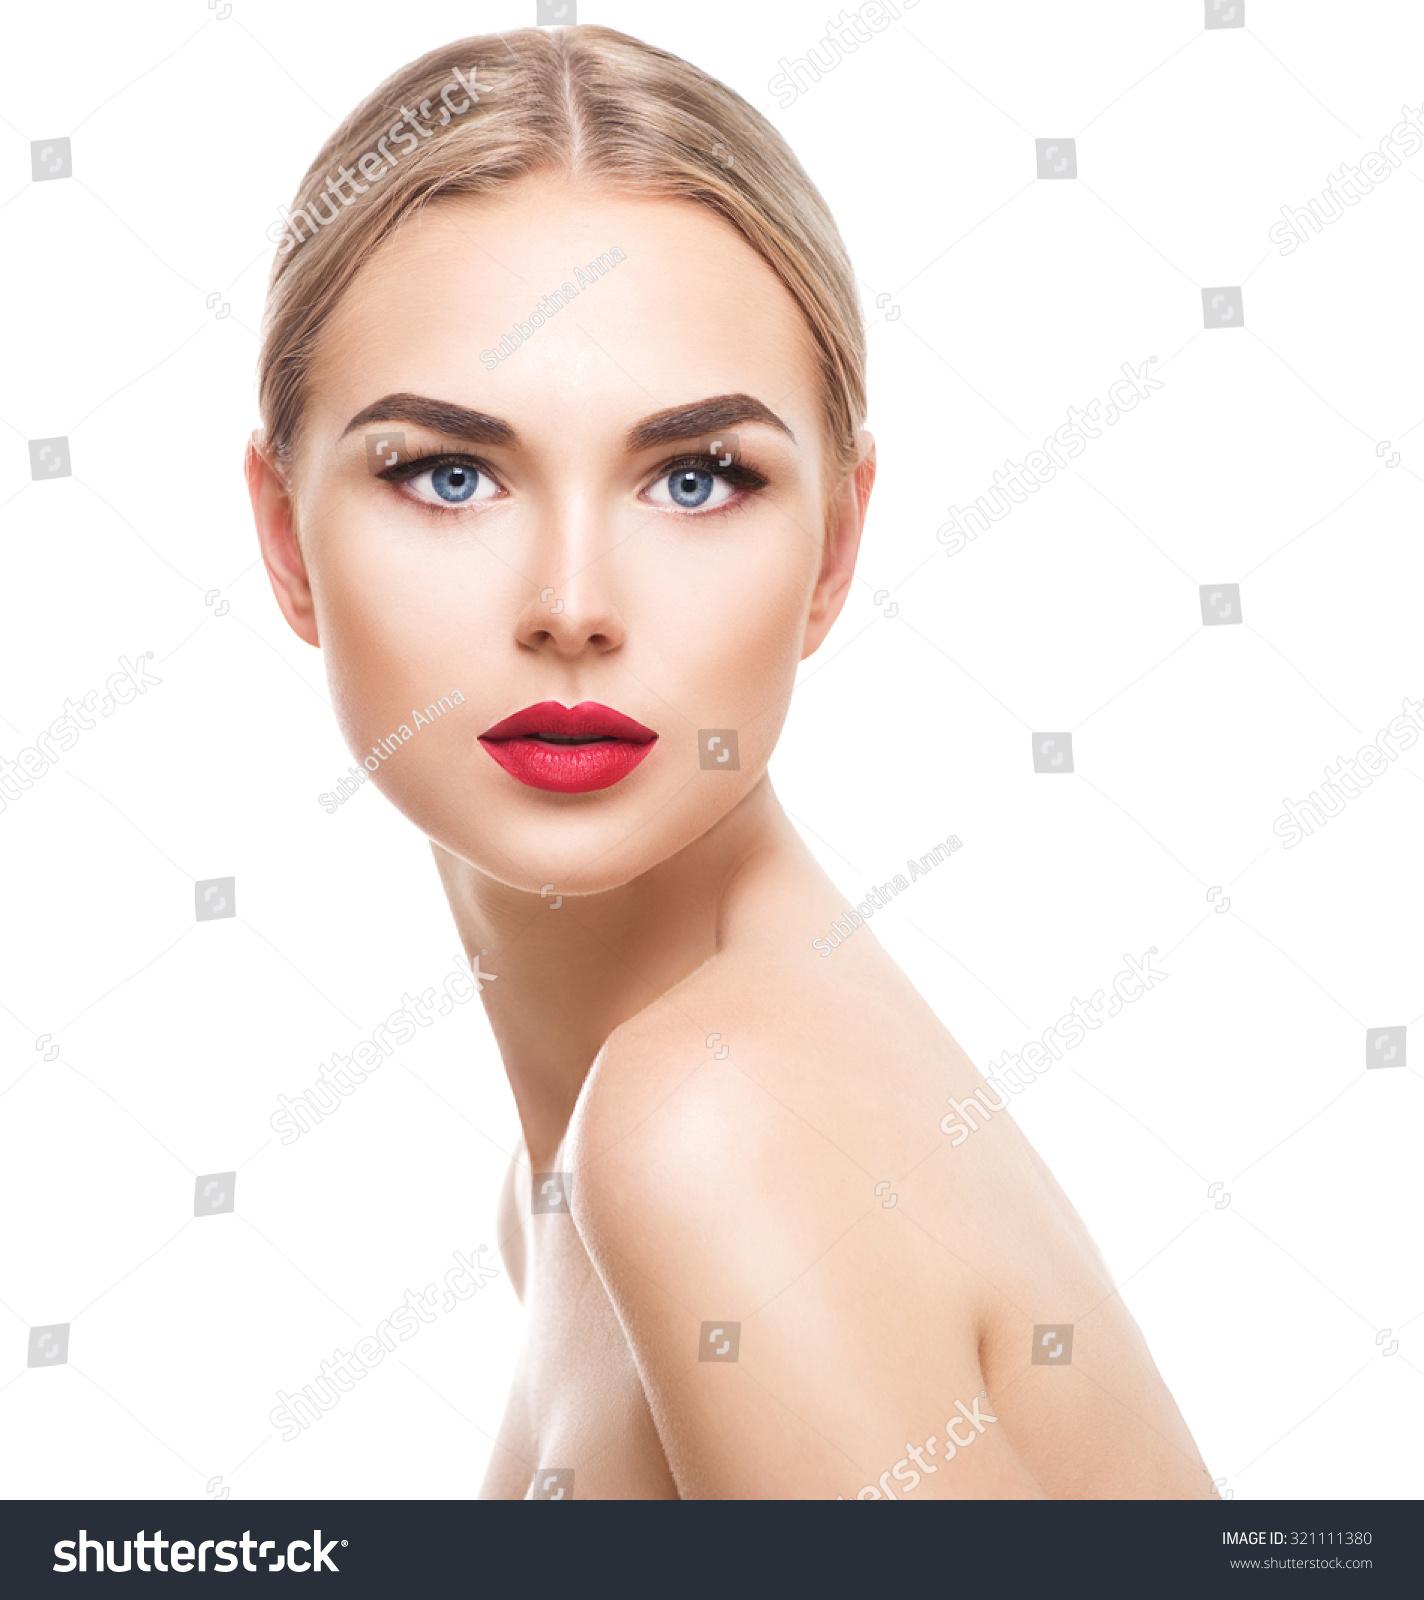 Beauty model girl perfect makeup looking stock photo 321111380 shutterstock - Garls perpact ...